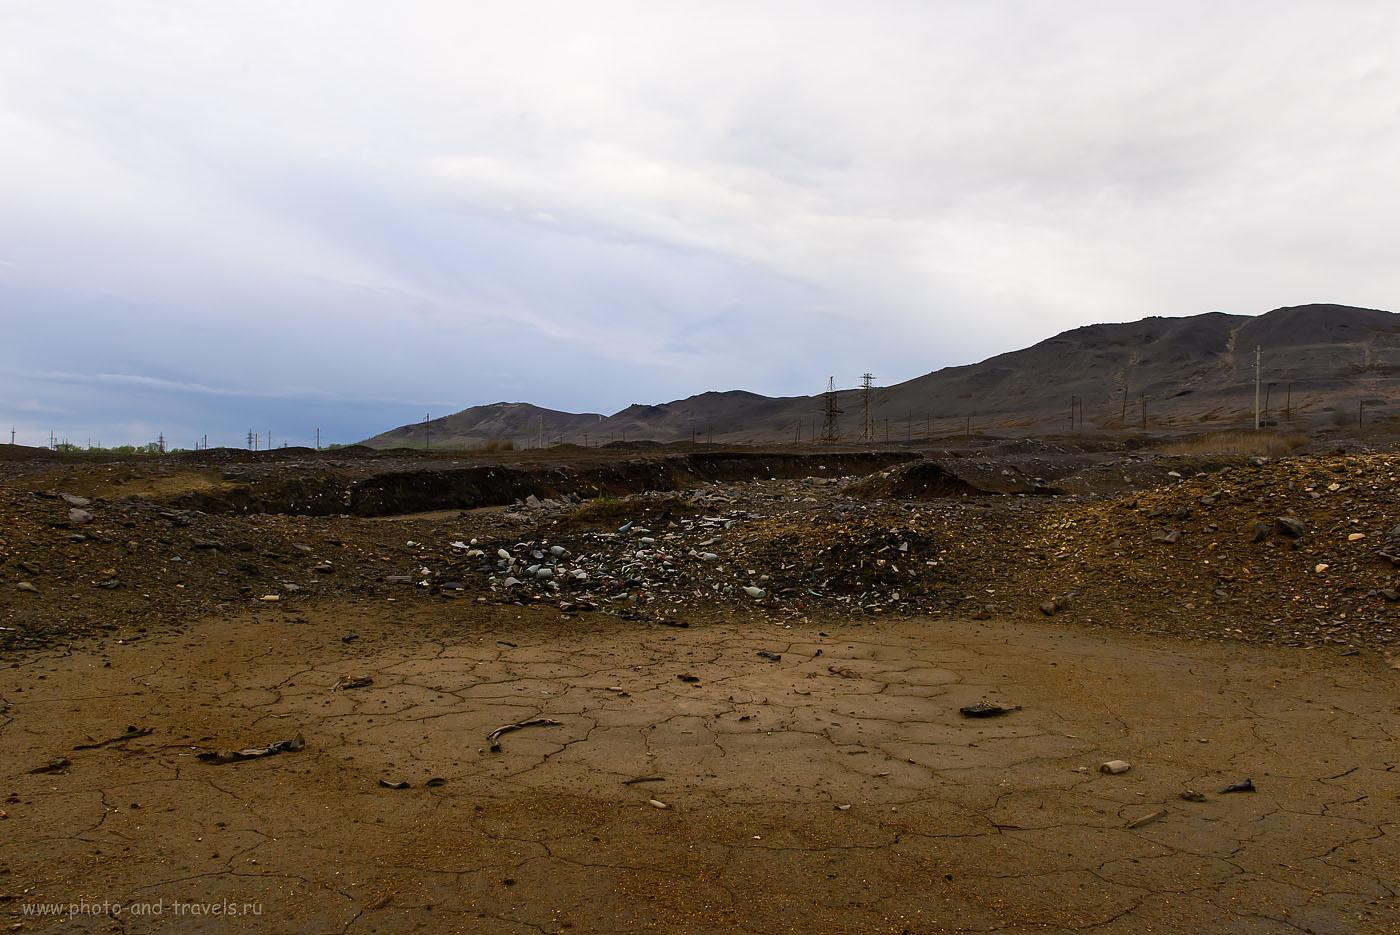 "Фото 18. Пустыня ""Карабаш"" (1000, 24, 10.0, 1/320)"